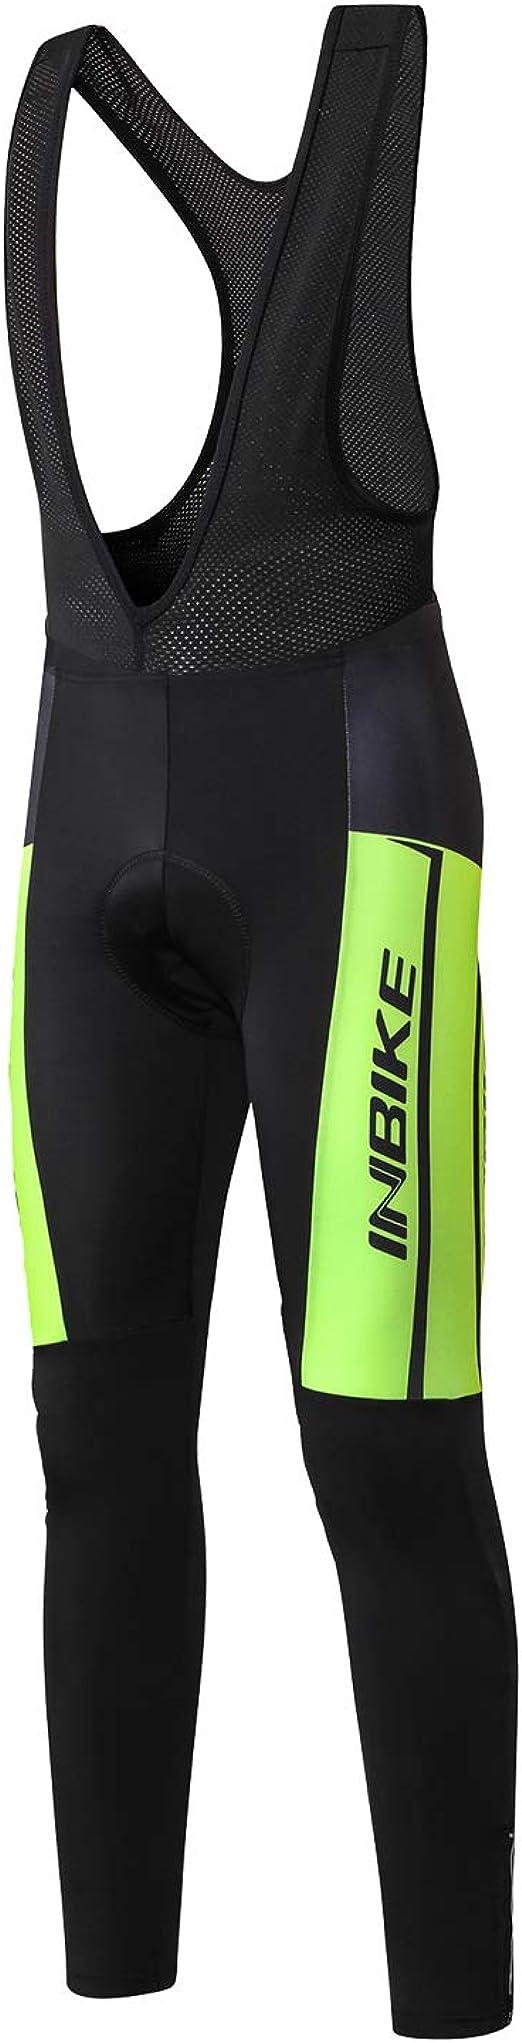 Herren Fahrrad Trägerhose Skinsuit Fleece Gepolsterte MTB Long Pants Reflective